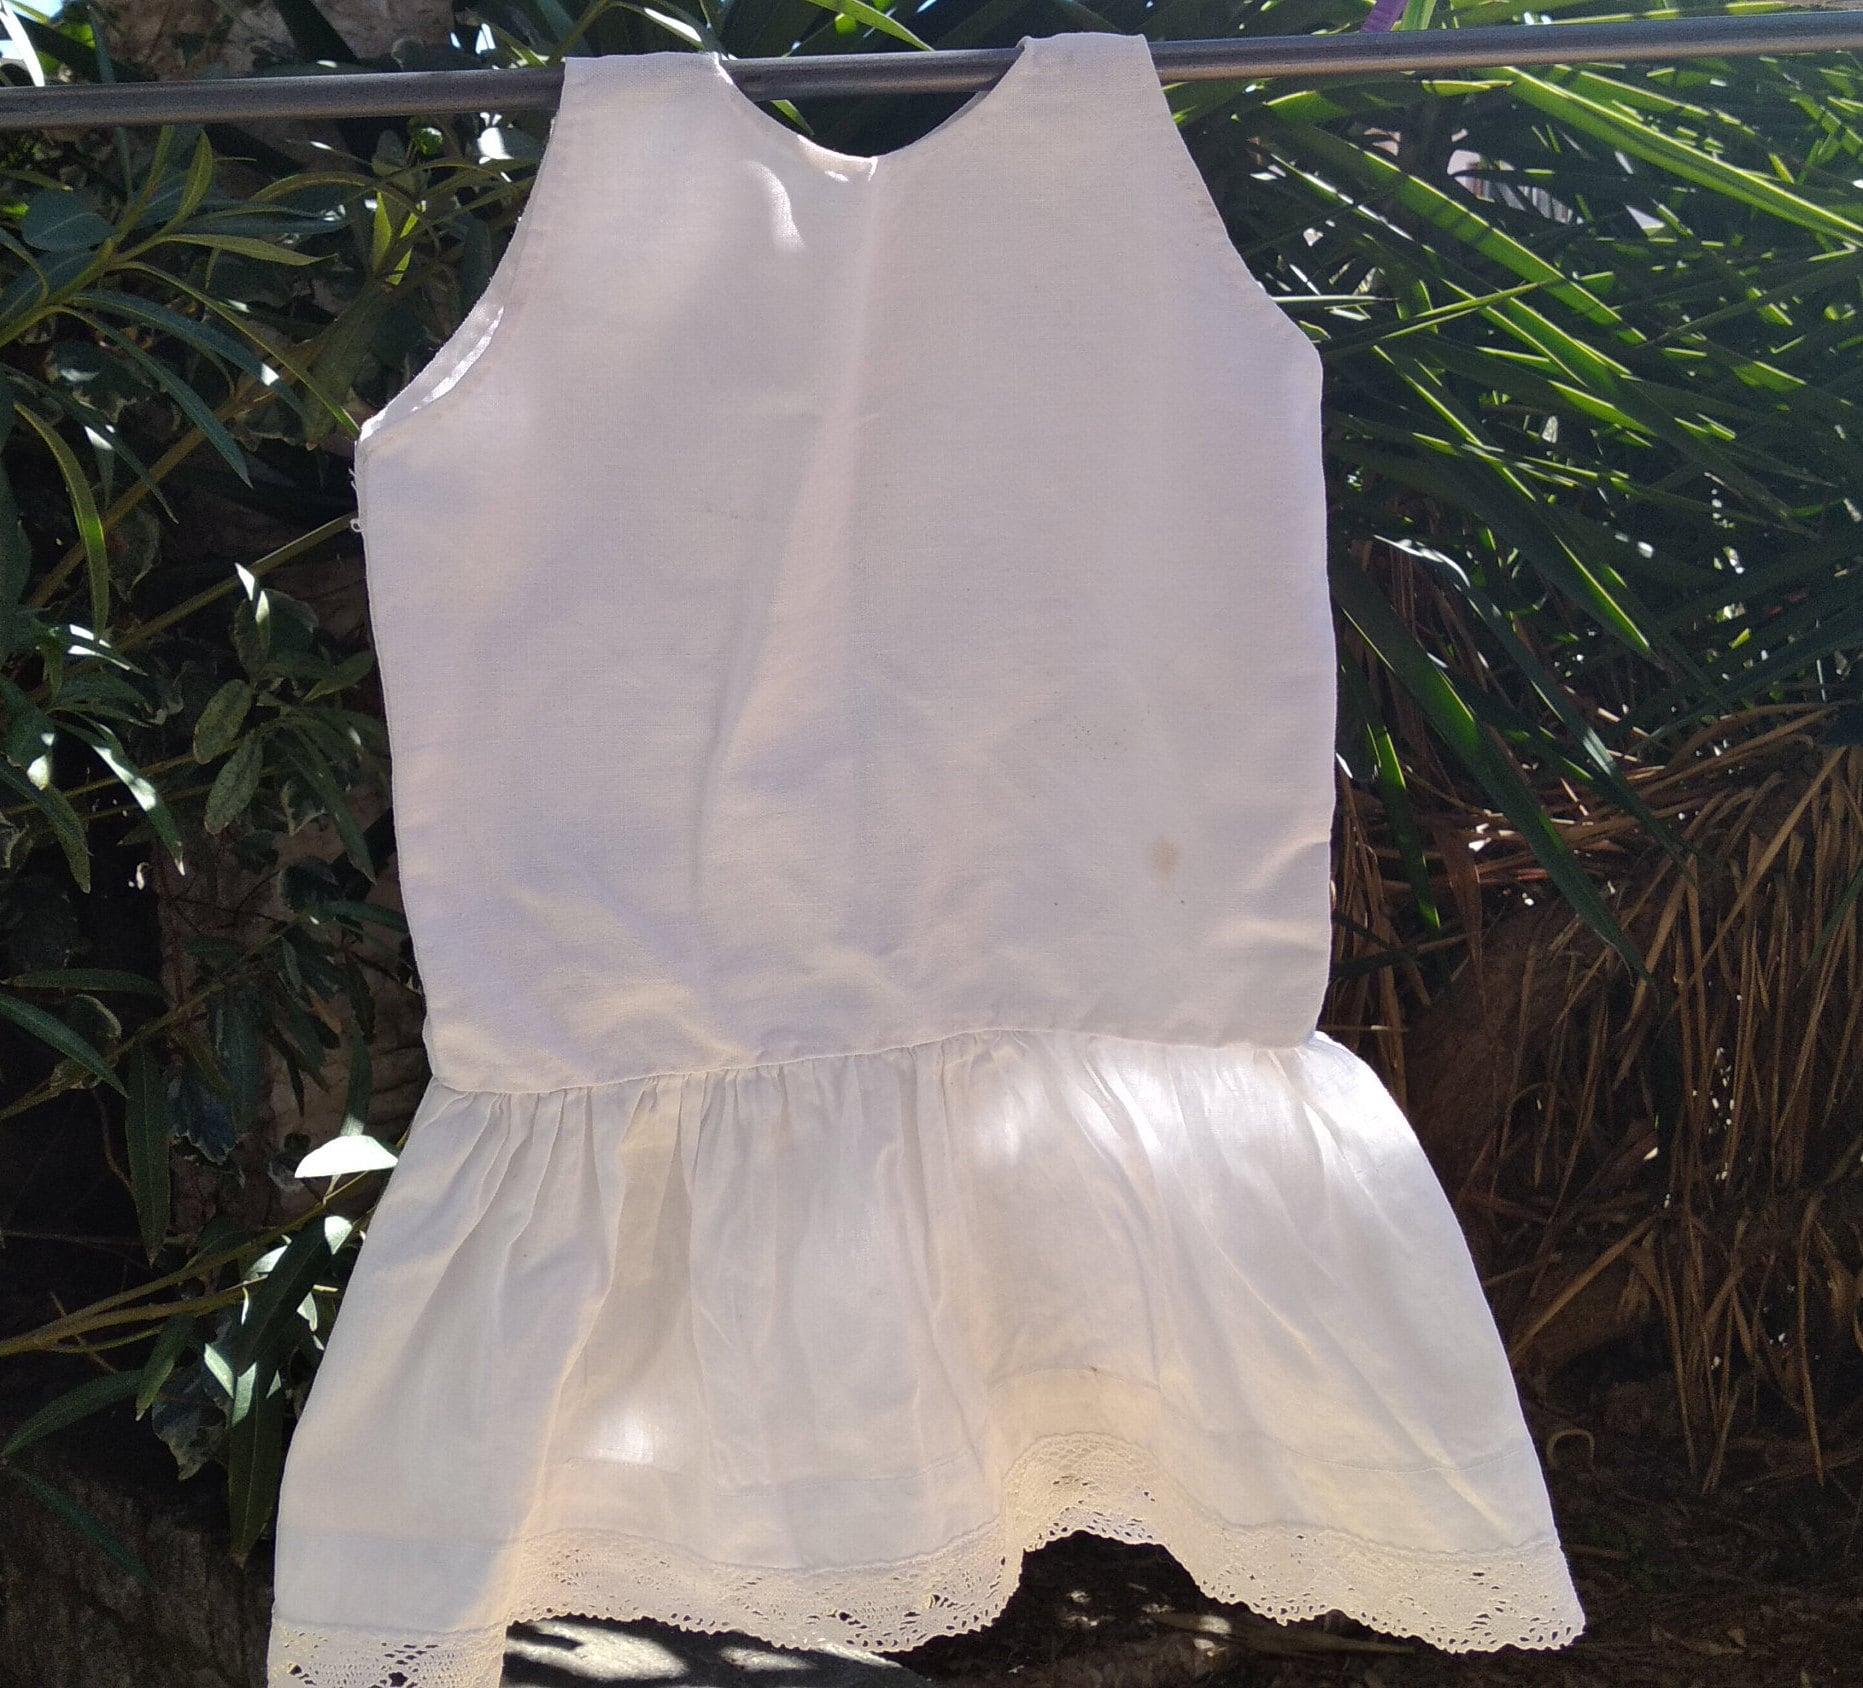 4a8227dd0b65 Antique Slip French Girl Under Dress Slip White Hemp and Cotton ...